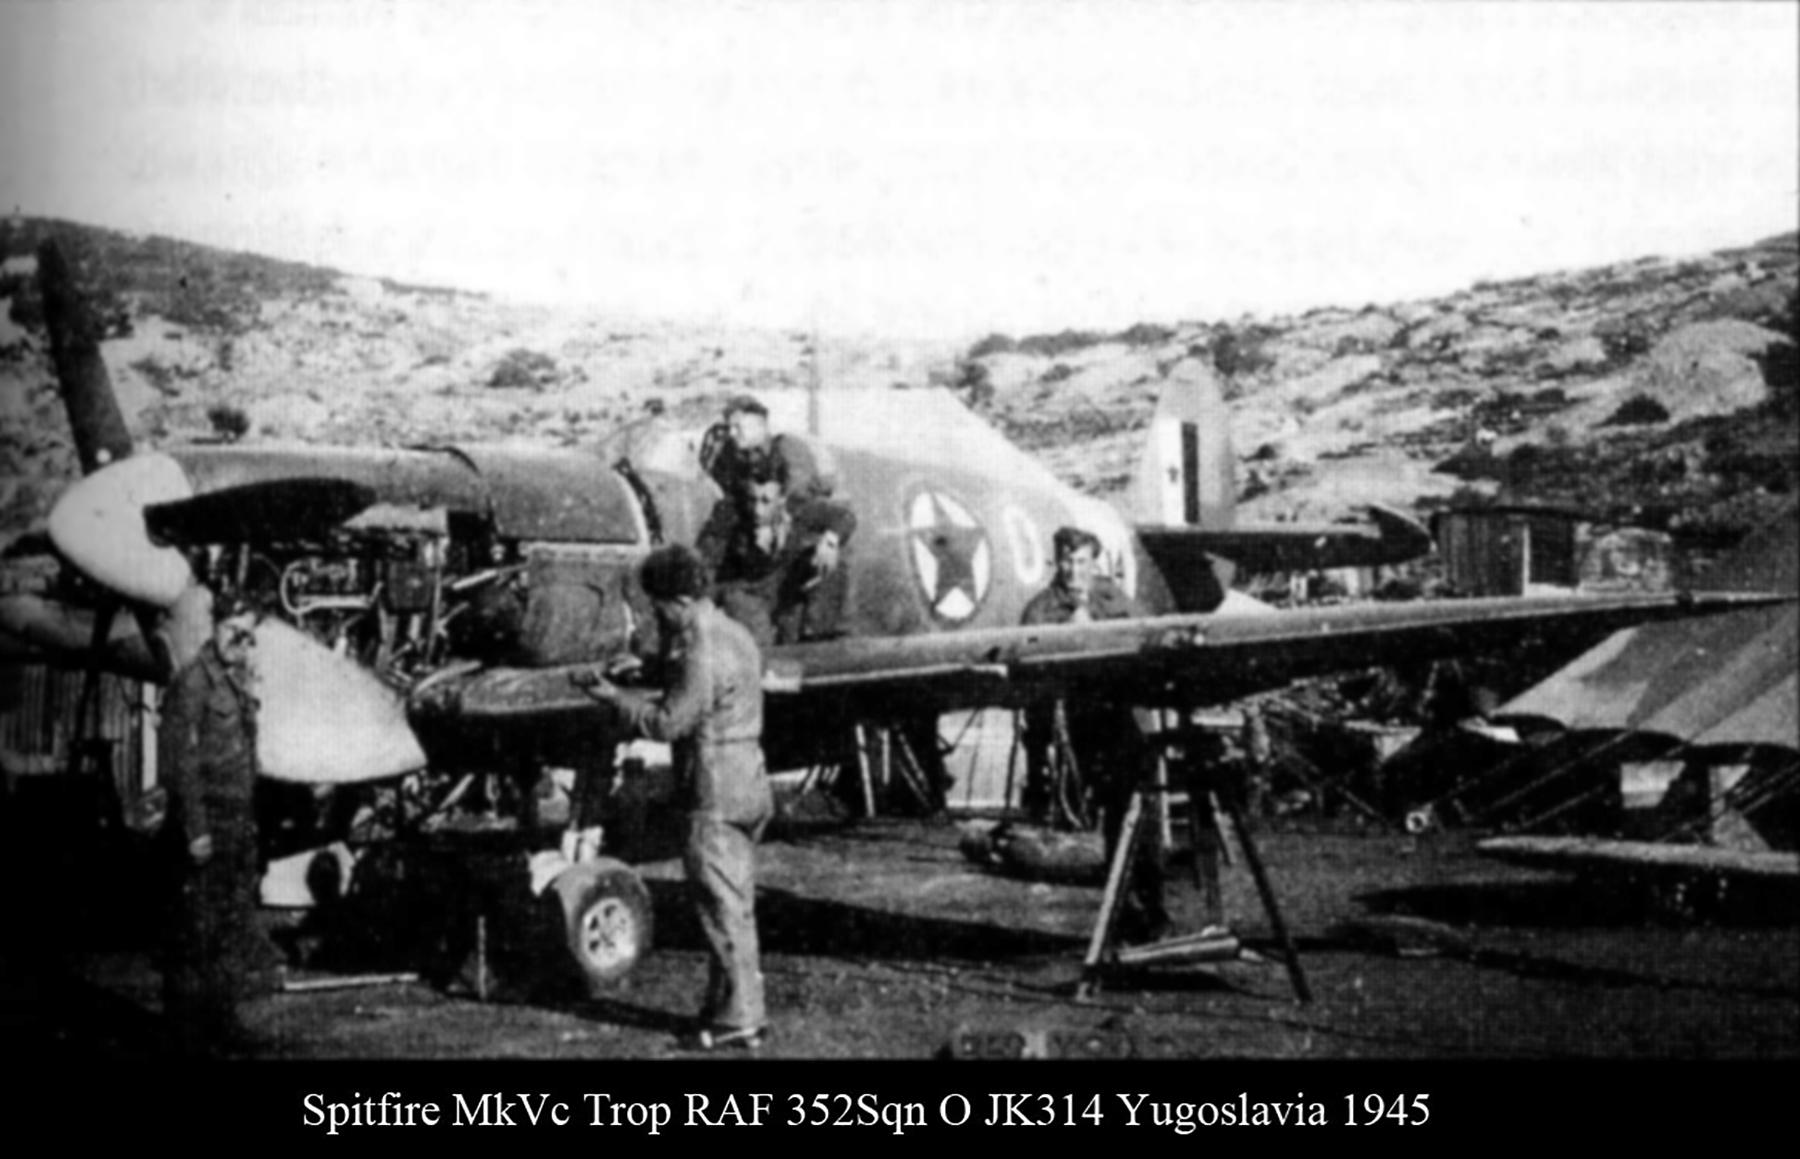 Spitfire MkVcTrop RAF 352Sqn O JK314 Yugoslavia 1945 02